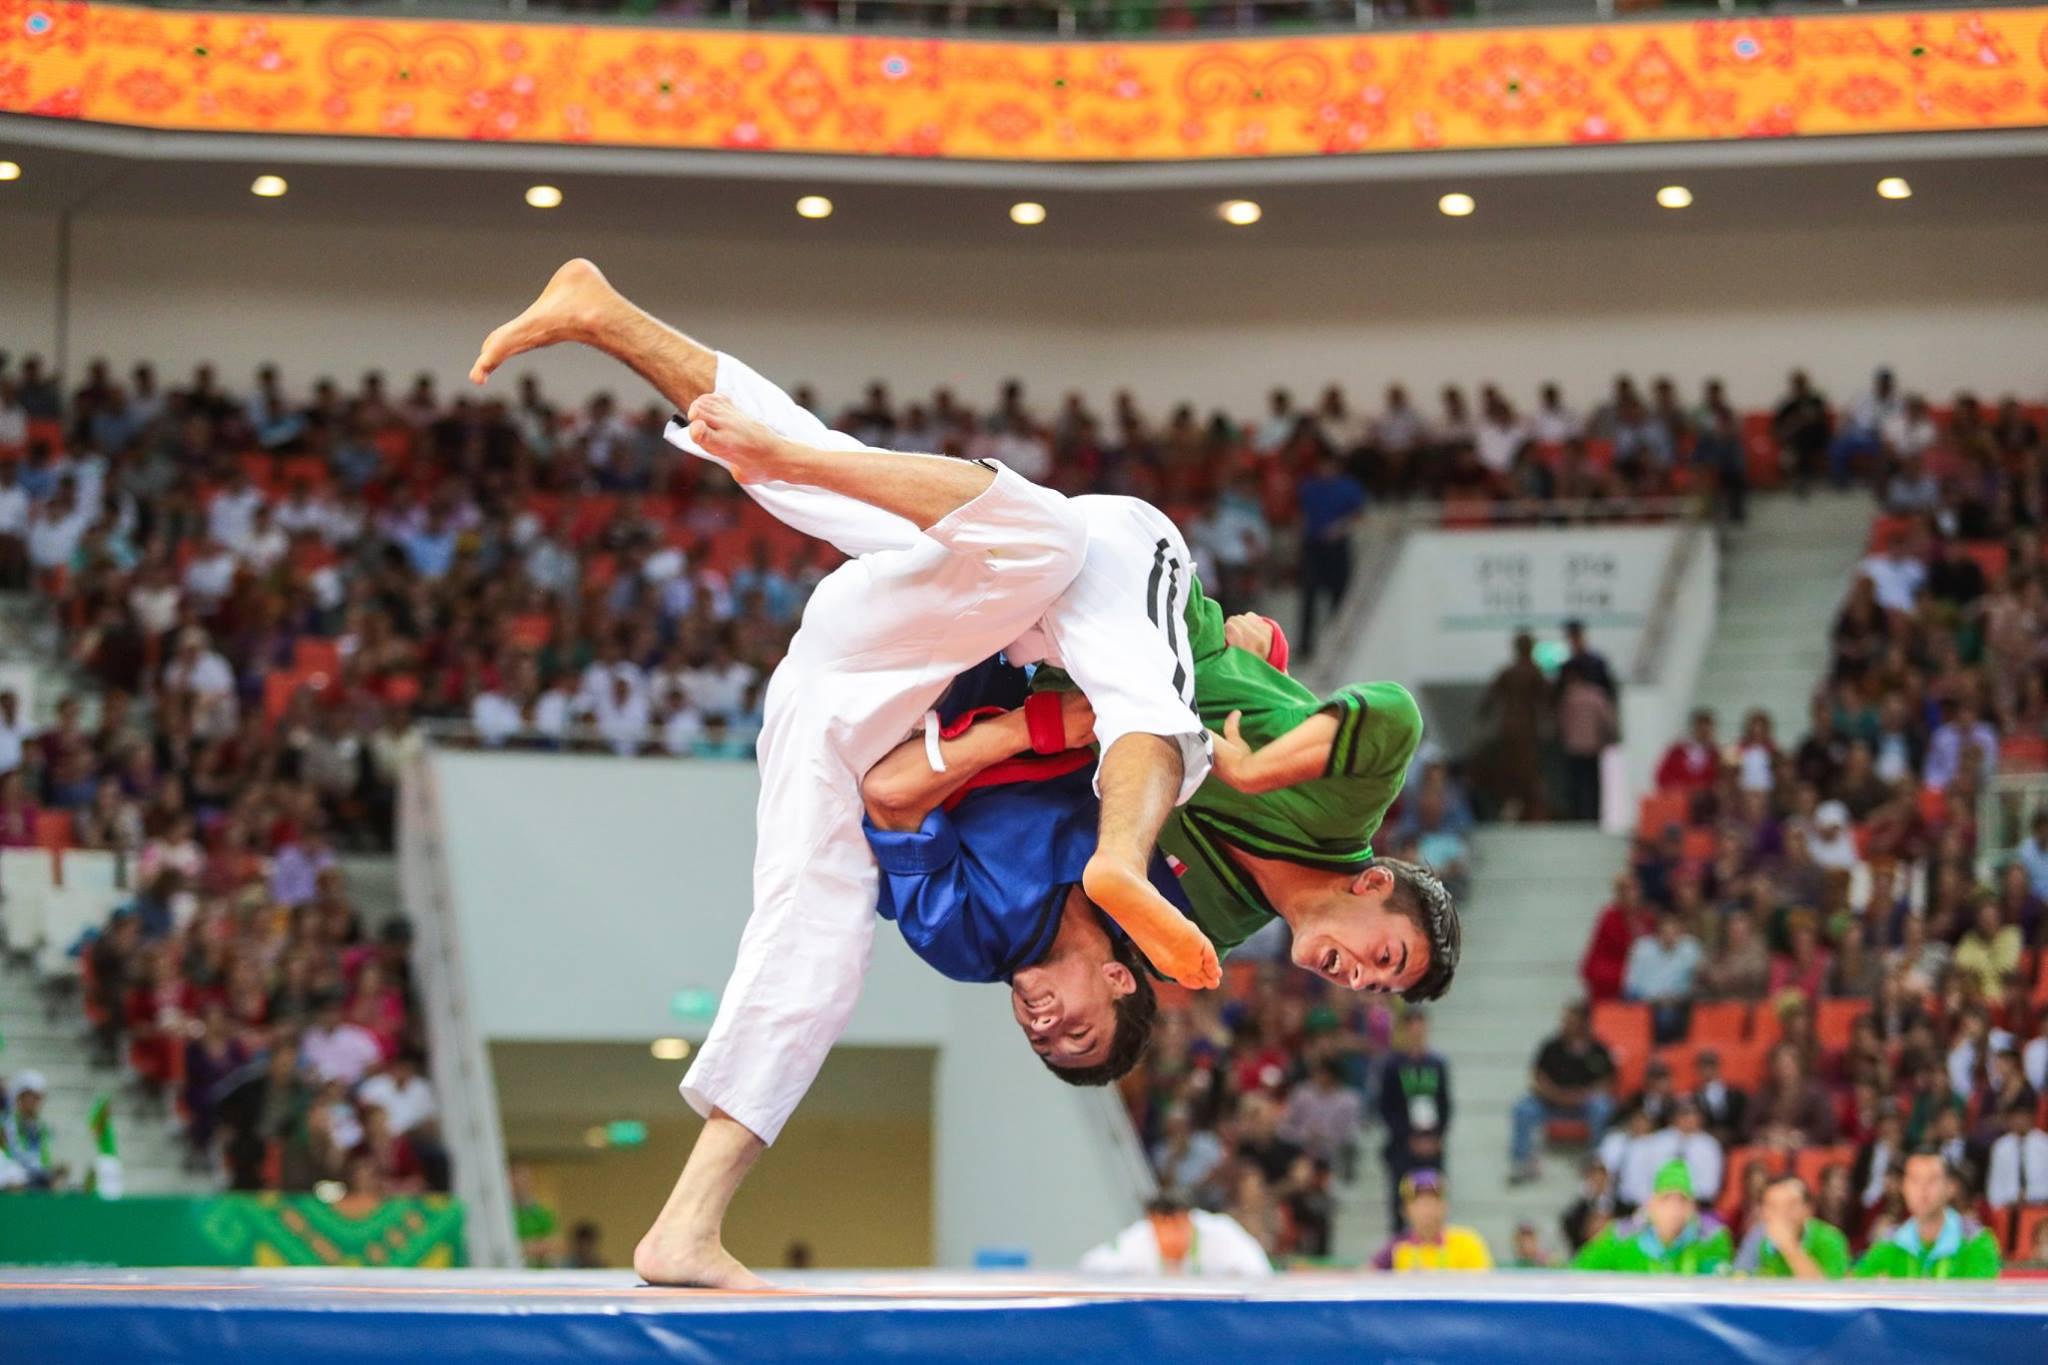 Turkmenistan's Tirkisgeldi Aýazow beat Tajikistan's Mehrzod Sufiev on his way to claiming the men's alysh free under 60 kilograms title in belt wrestling ©Ashgabat 2017/Facebook